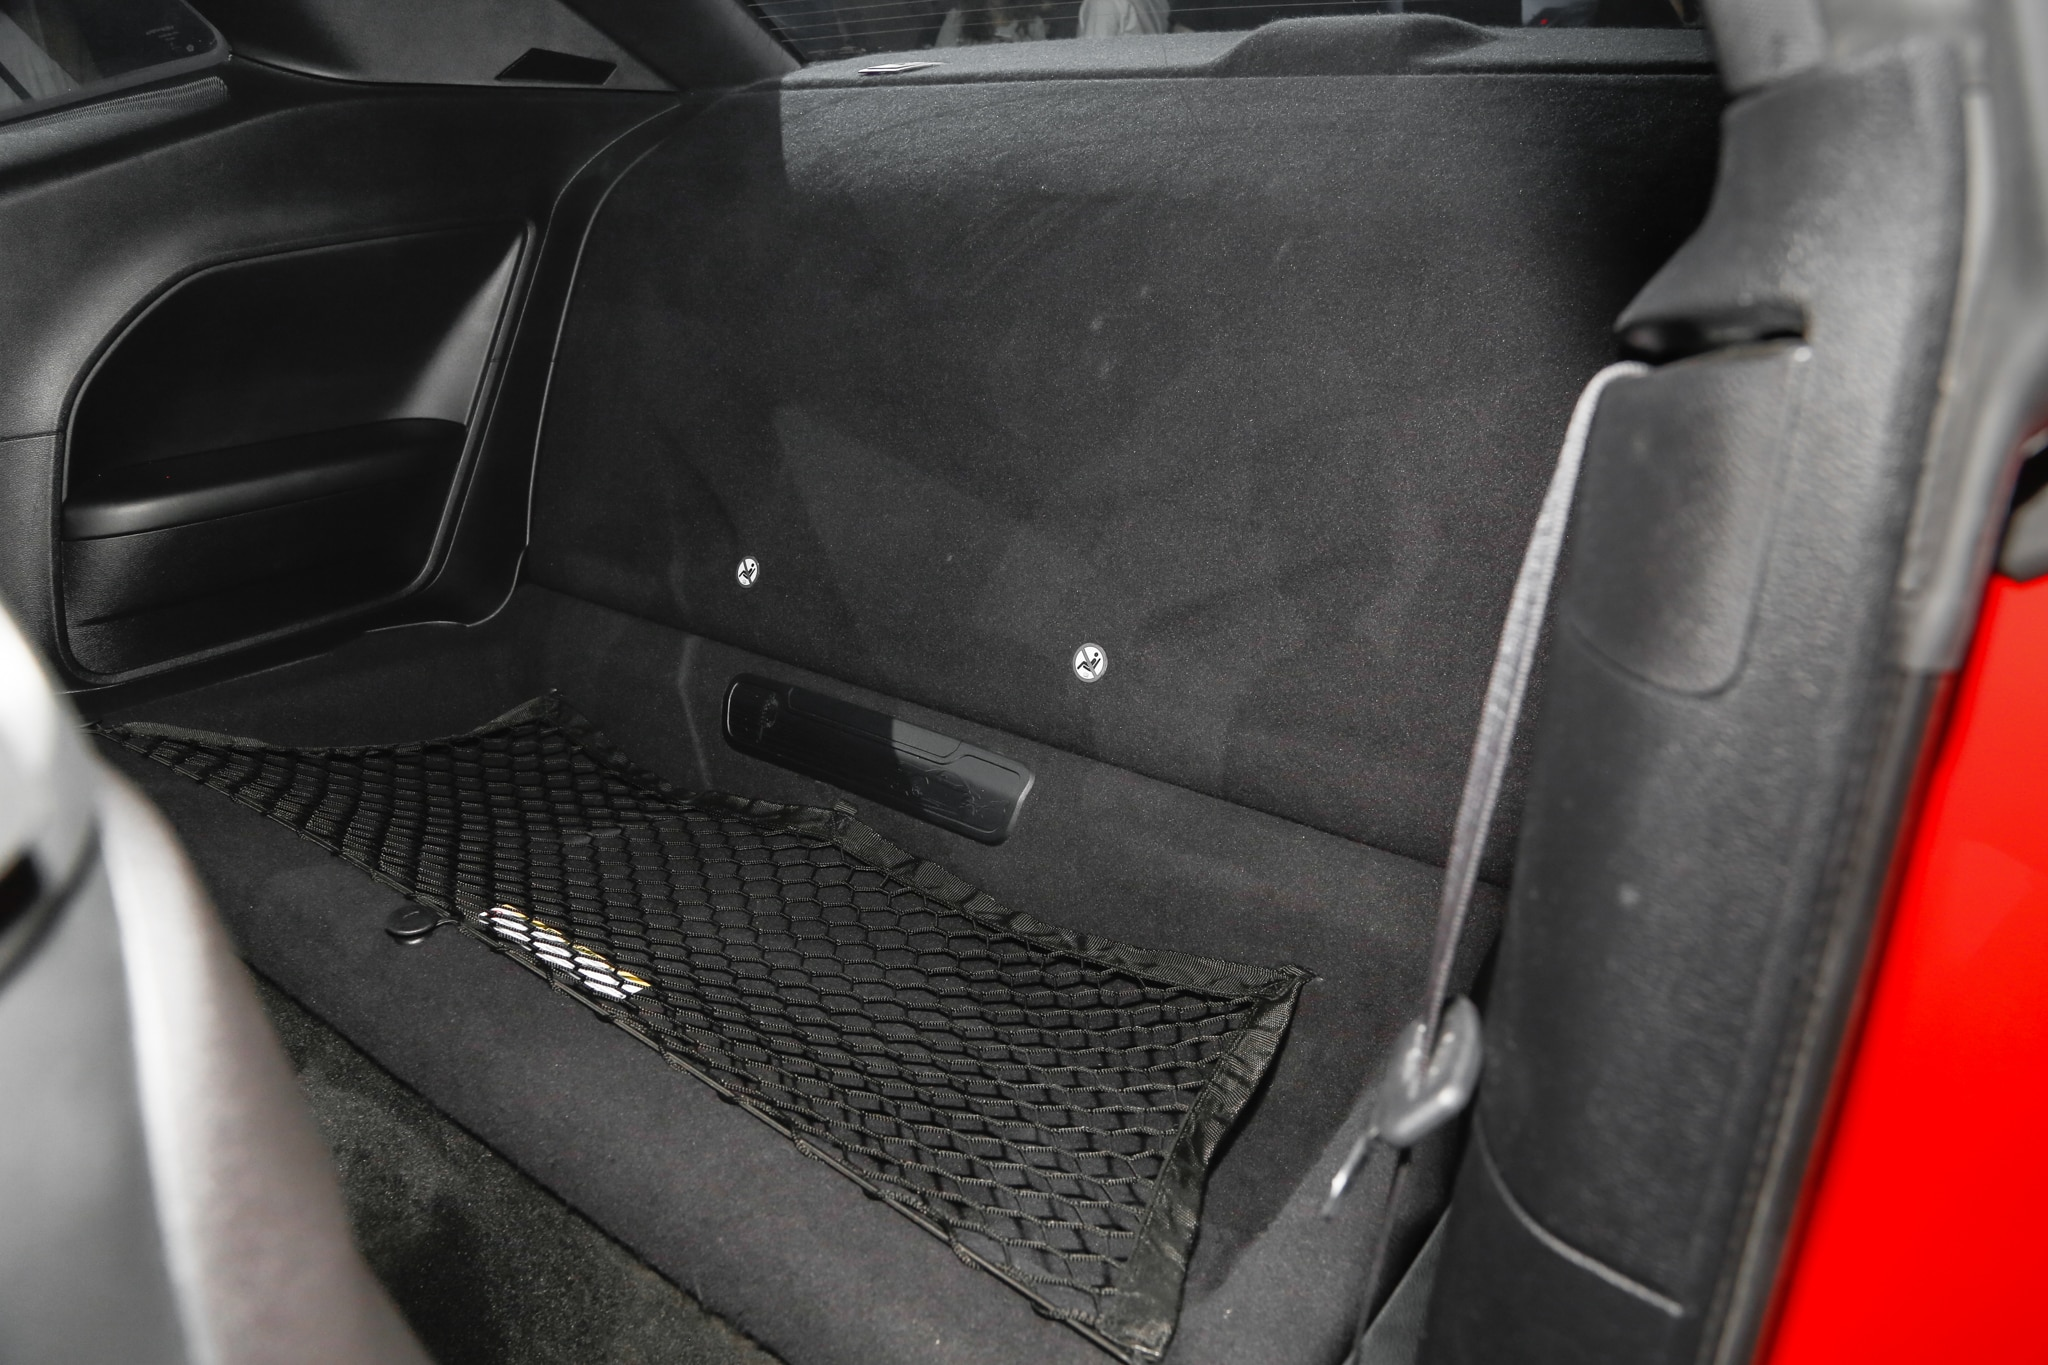 2018 Dodge Challenger Srt Demon Interior View 1 Show More